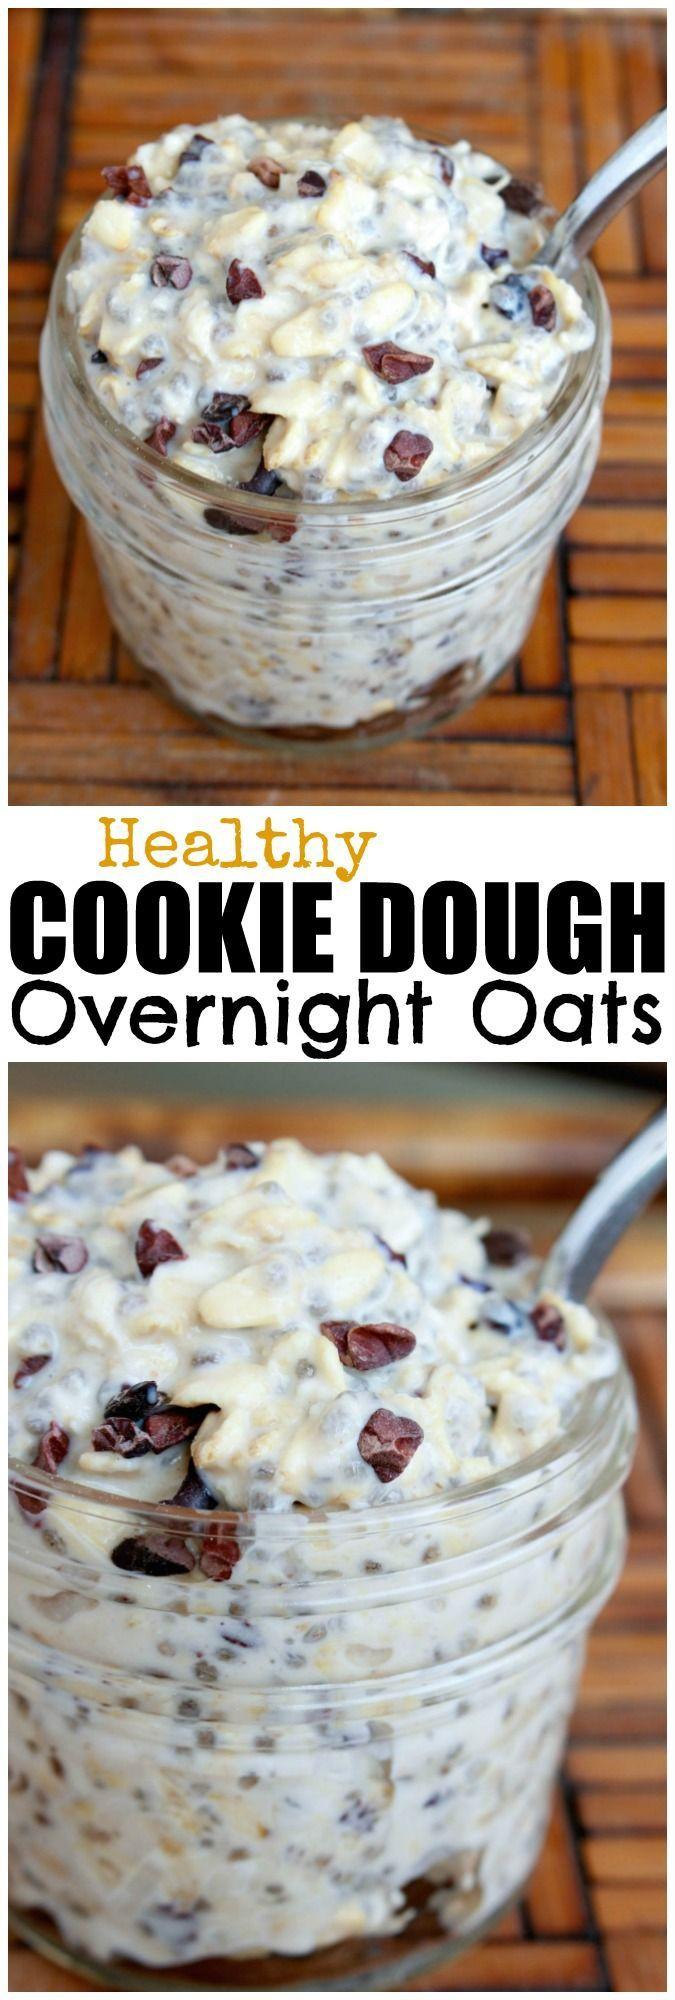 Overnight Oats Healthy  Best 25 Healthy overnight oats ideas on Pinterest